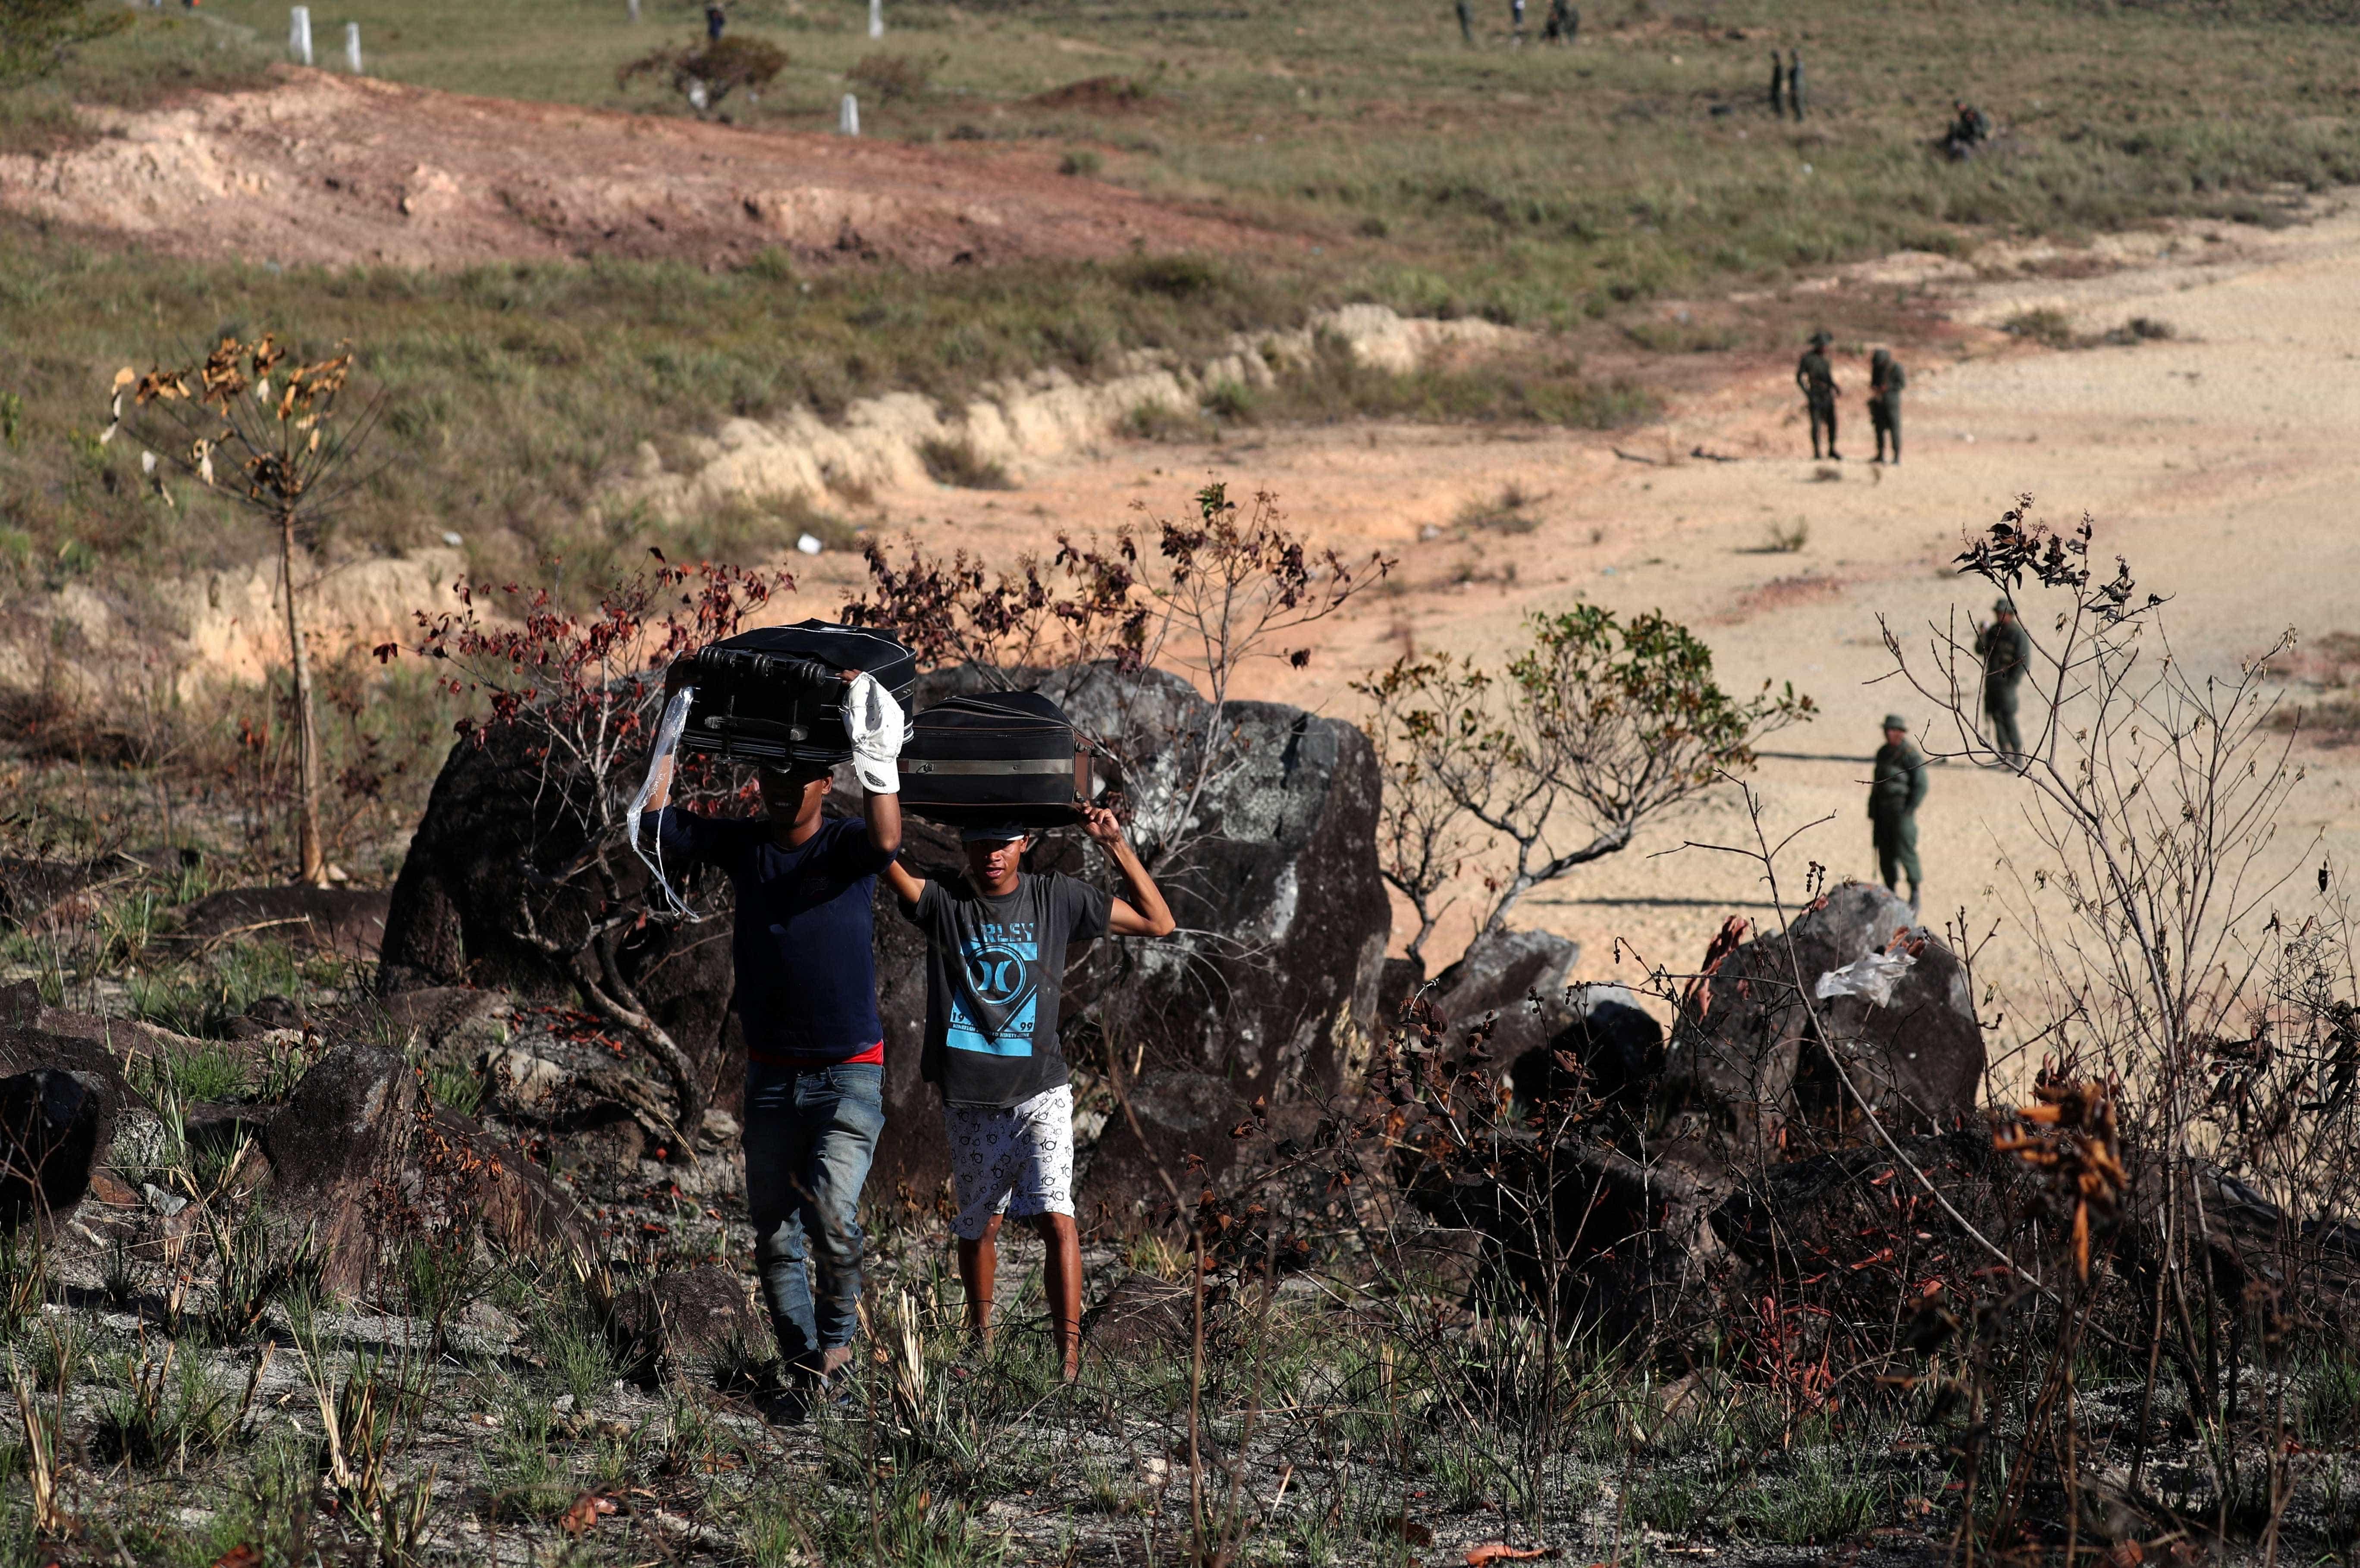 Militares lançam gás lacrimogéneo para evitar saída de venezuelanos